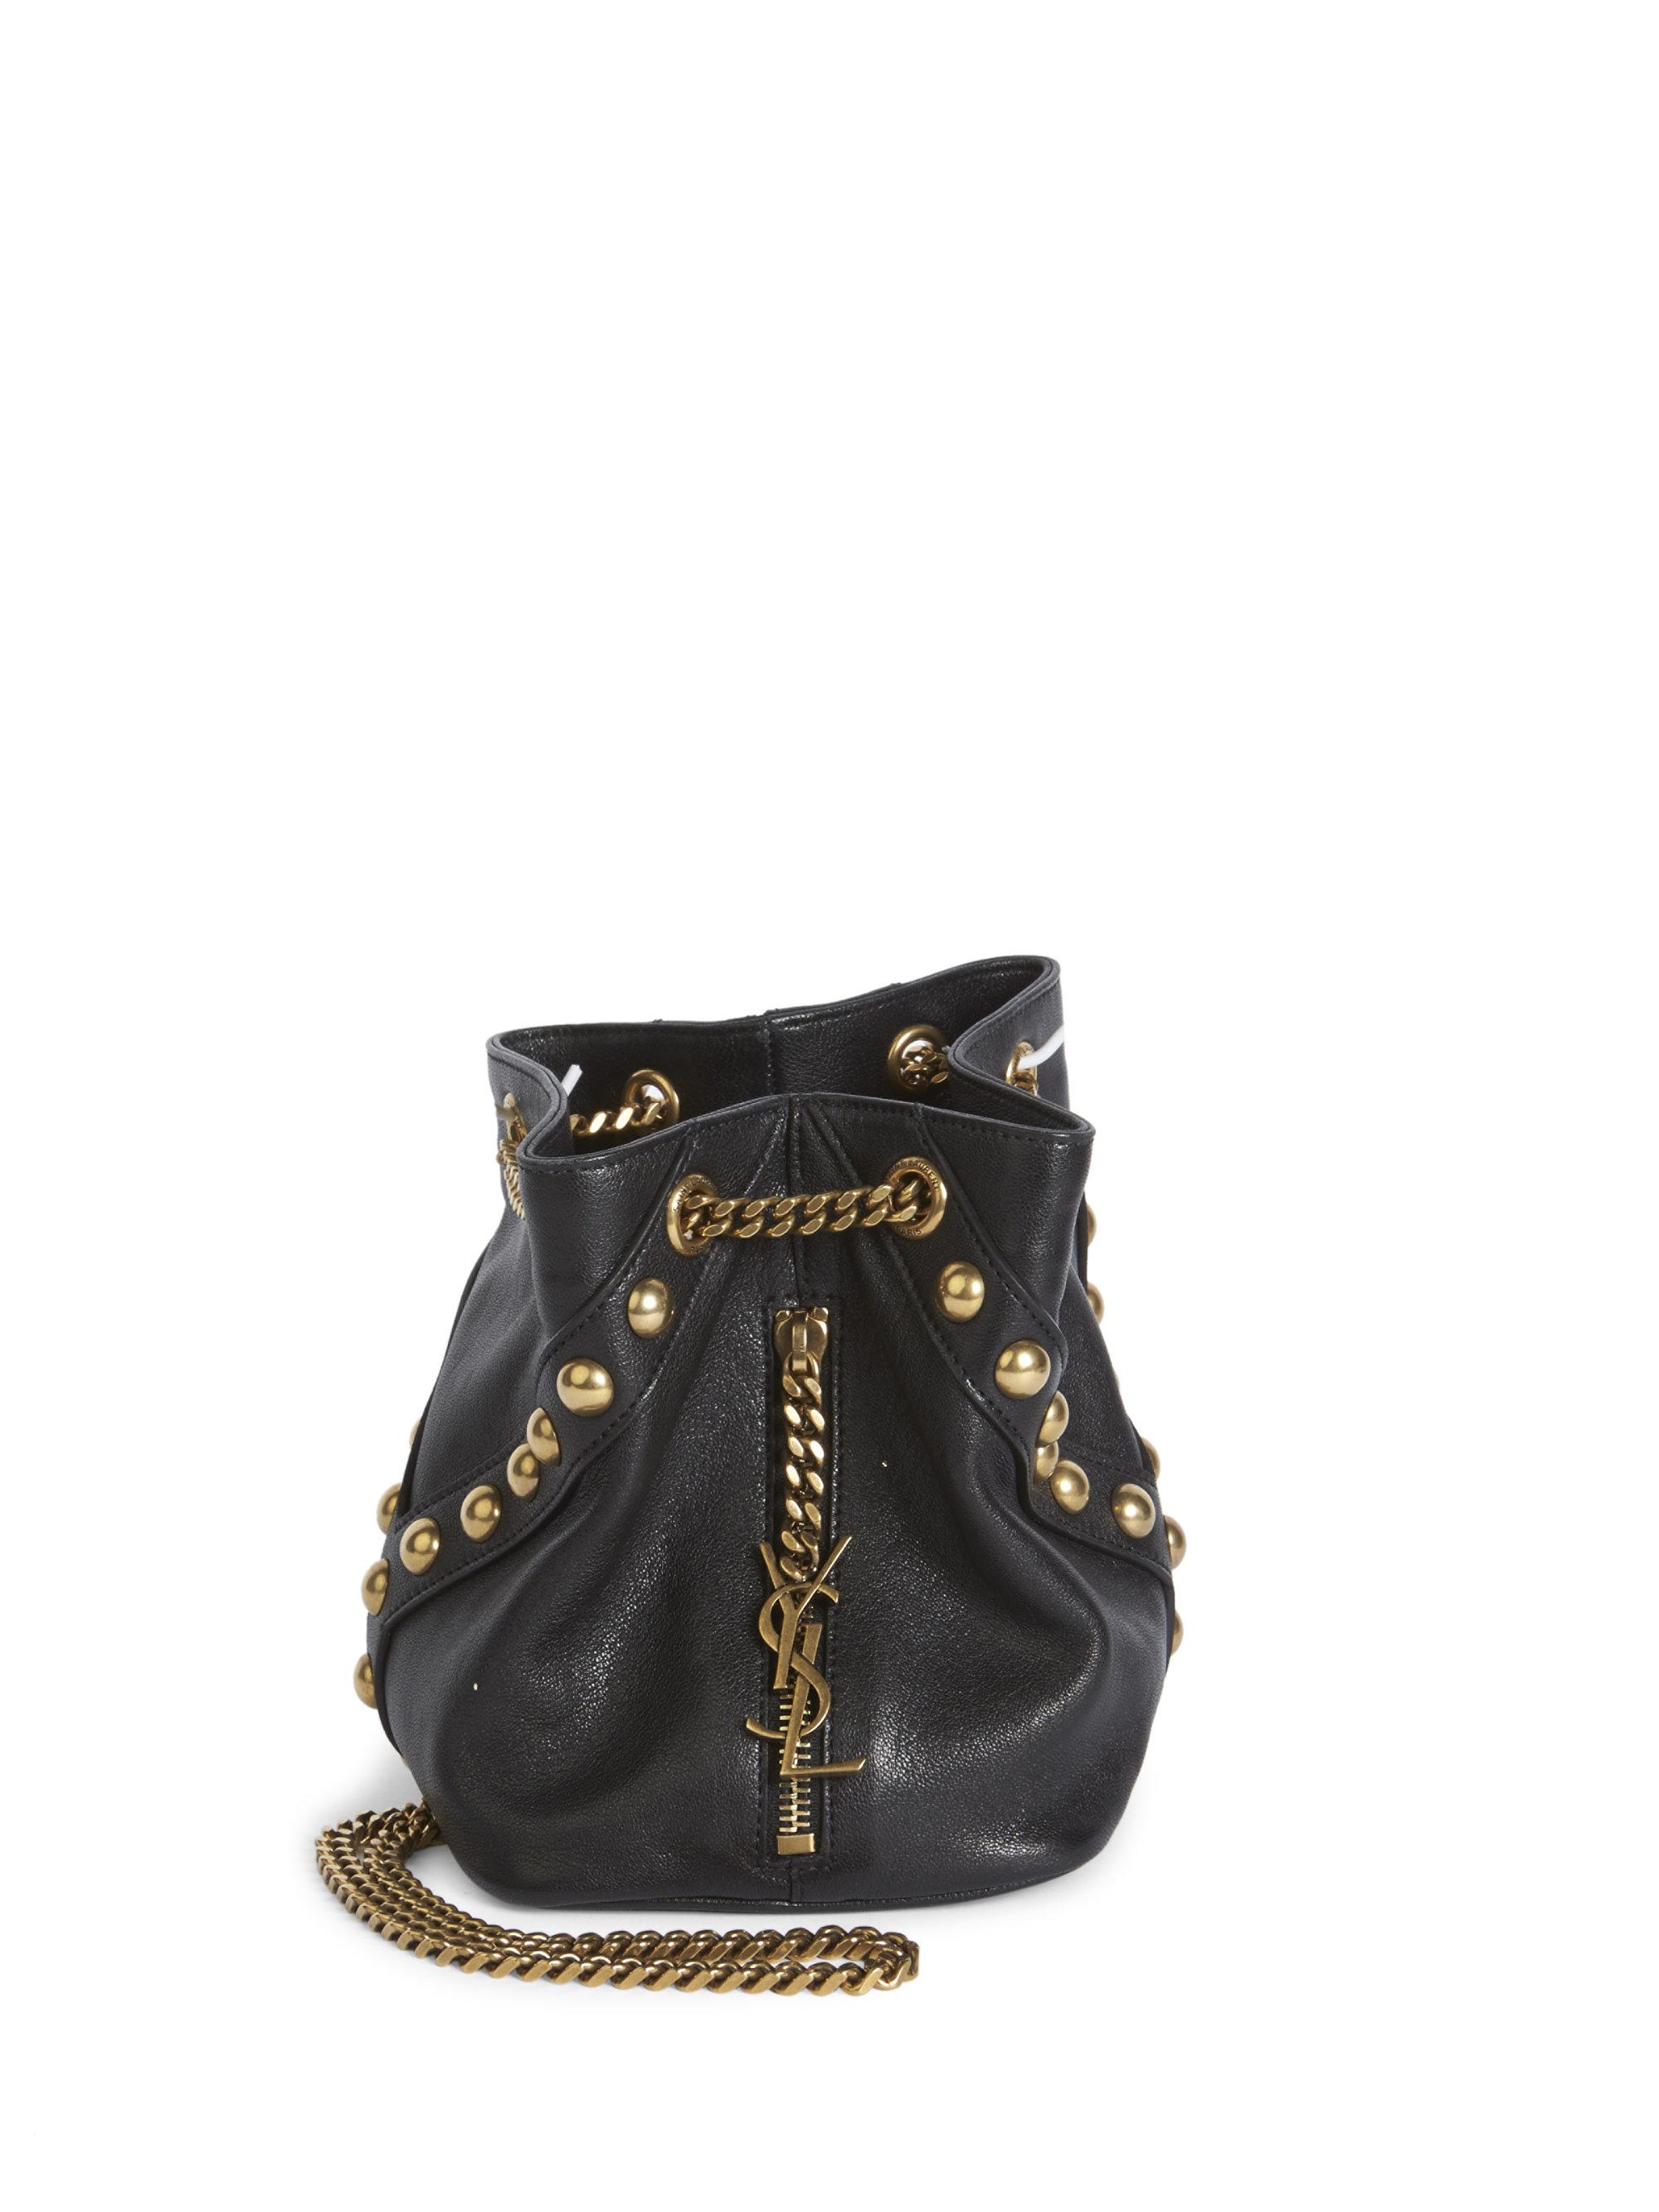 156fd729c10 Lyst - Saint Laurent Y Studs Baby Leather Chain Drawstring Bag in Black